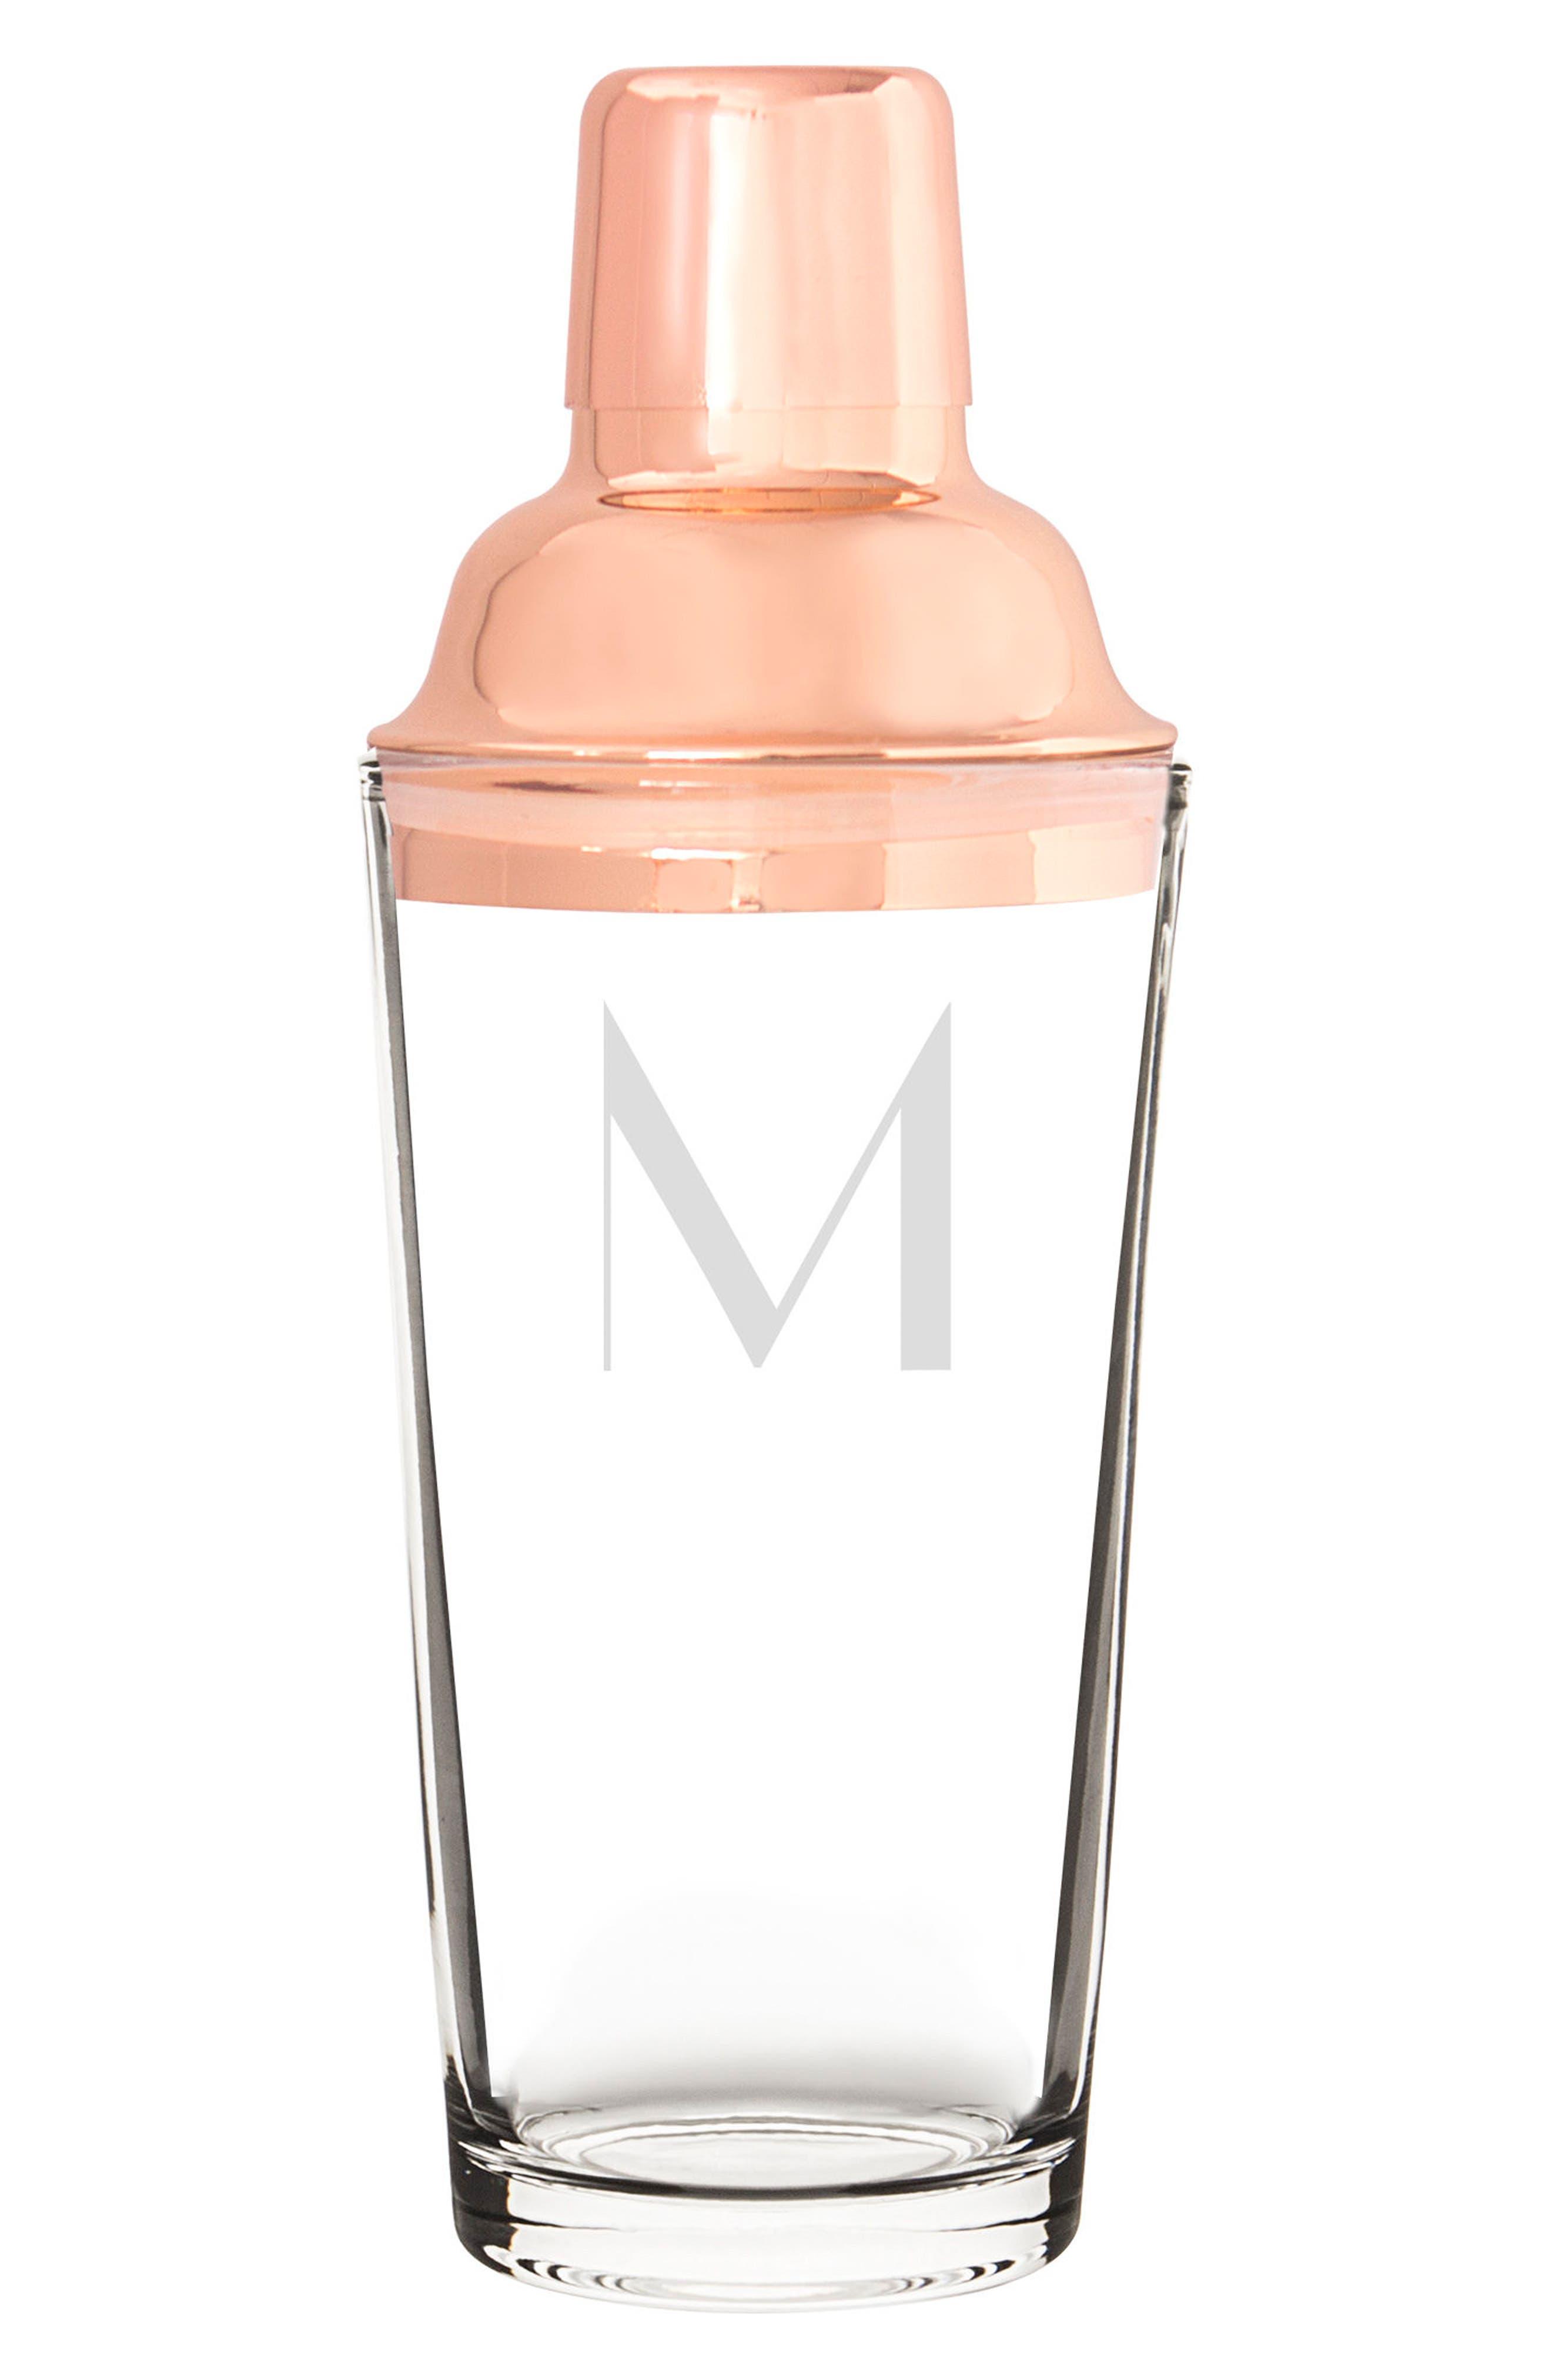 Monogram Coppertone Cocktail Shaker,                             Main thumbnail 14, color,